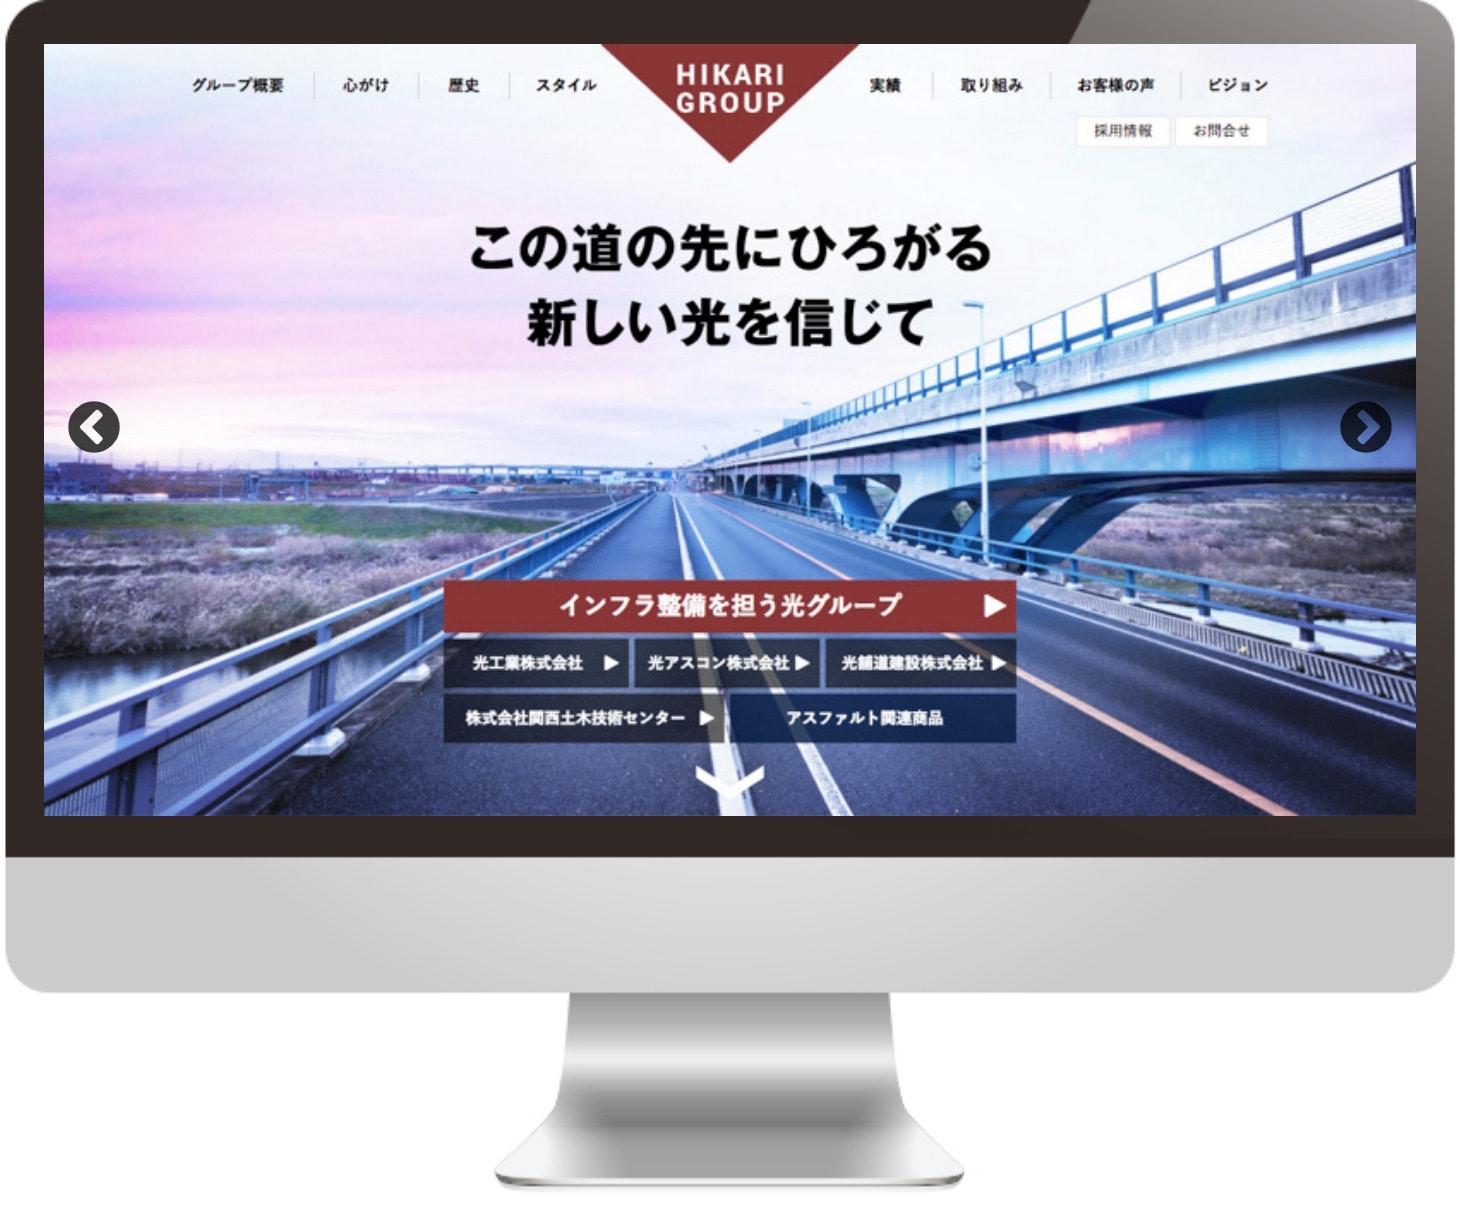 CI・ブランディング オフィシャルサイト